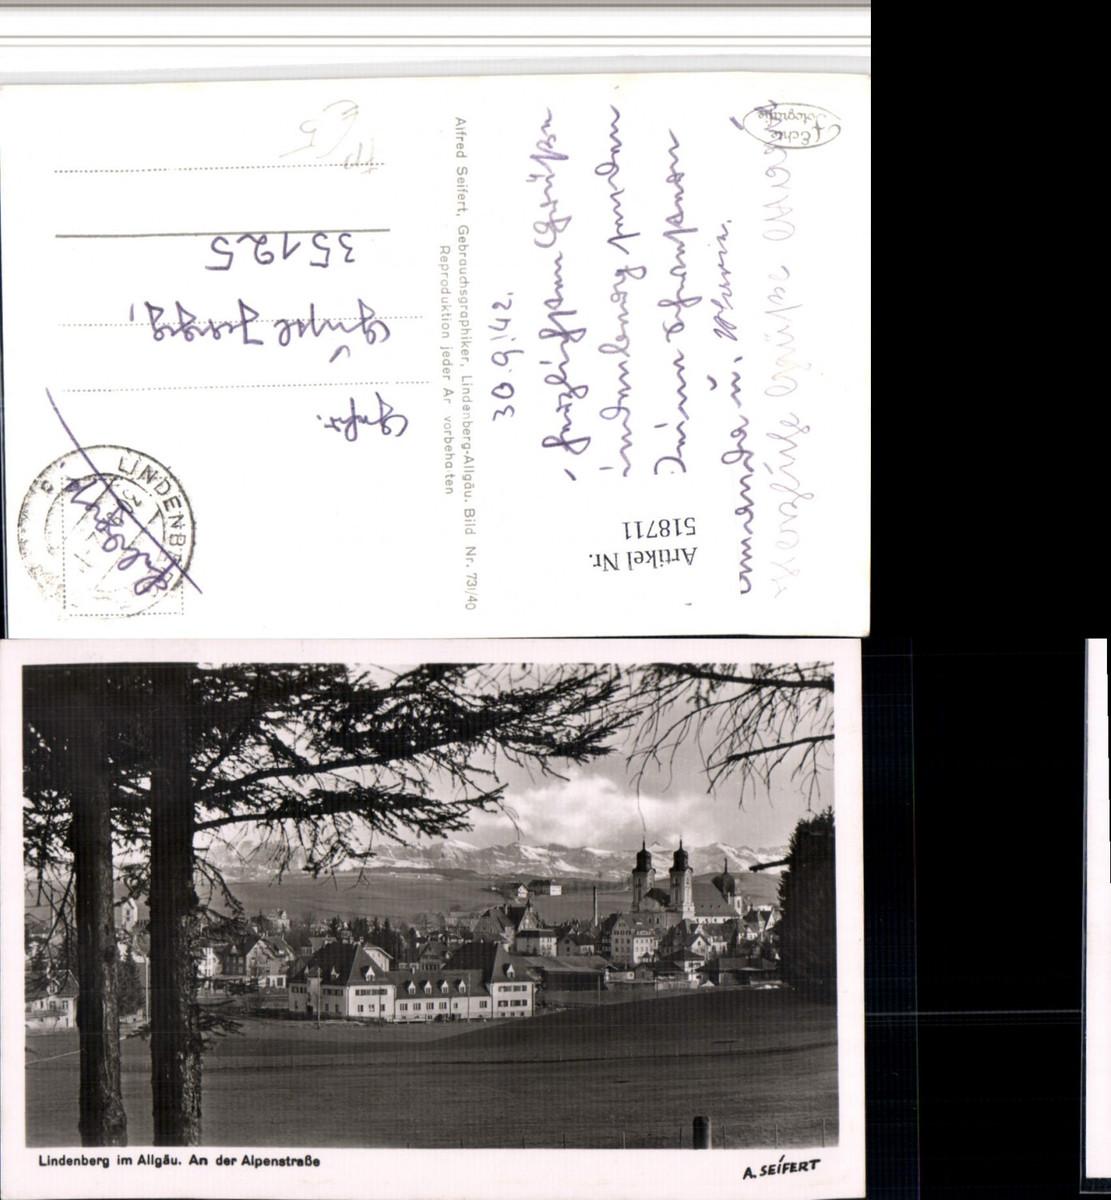 518711,Lindenberg im Allgäu Totale Bergkulisse Feldpost Nr. 35125 günstig online kaufen